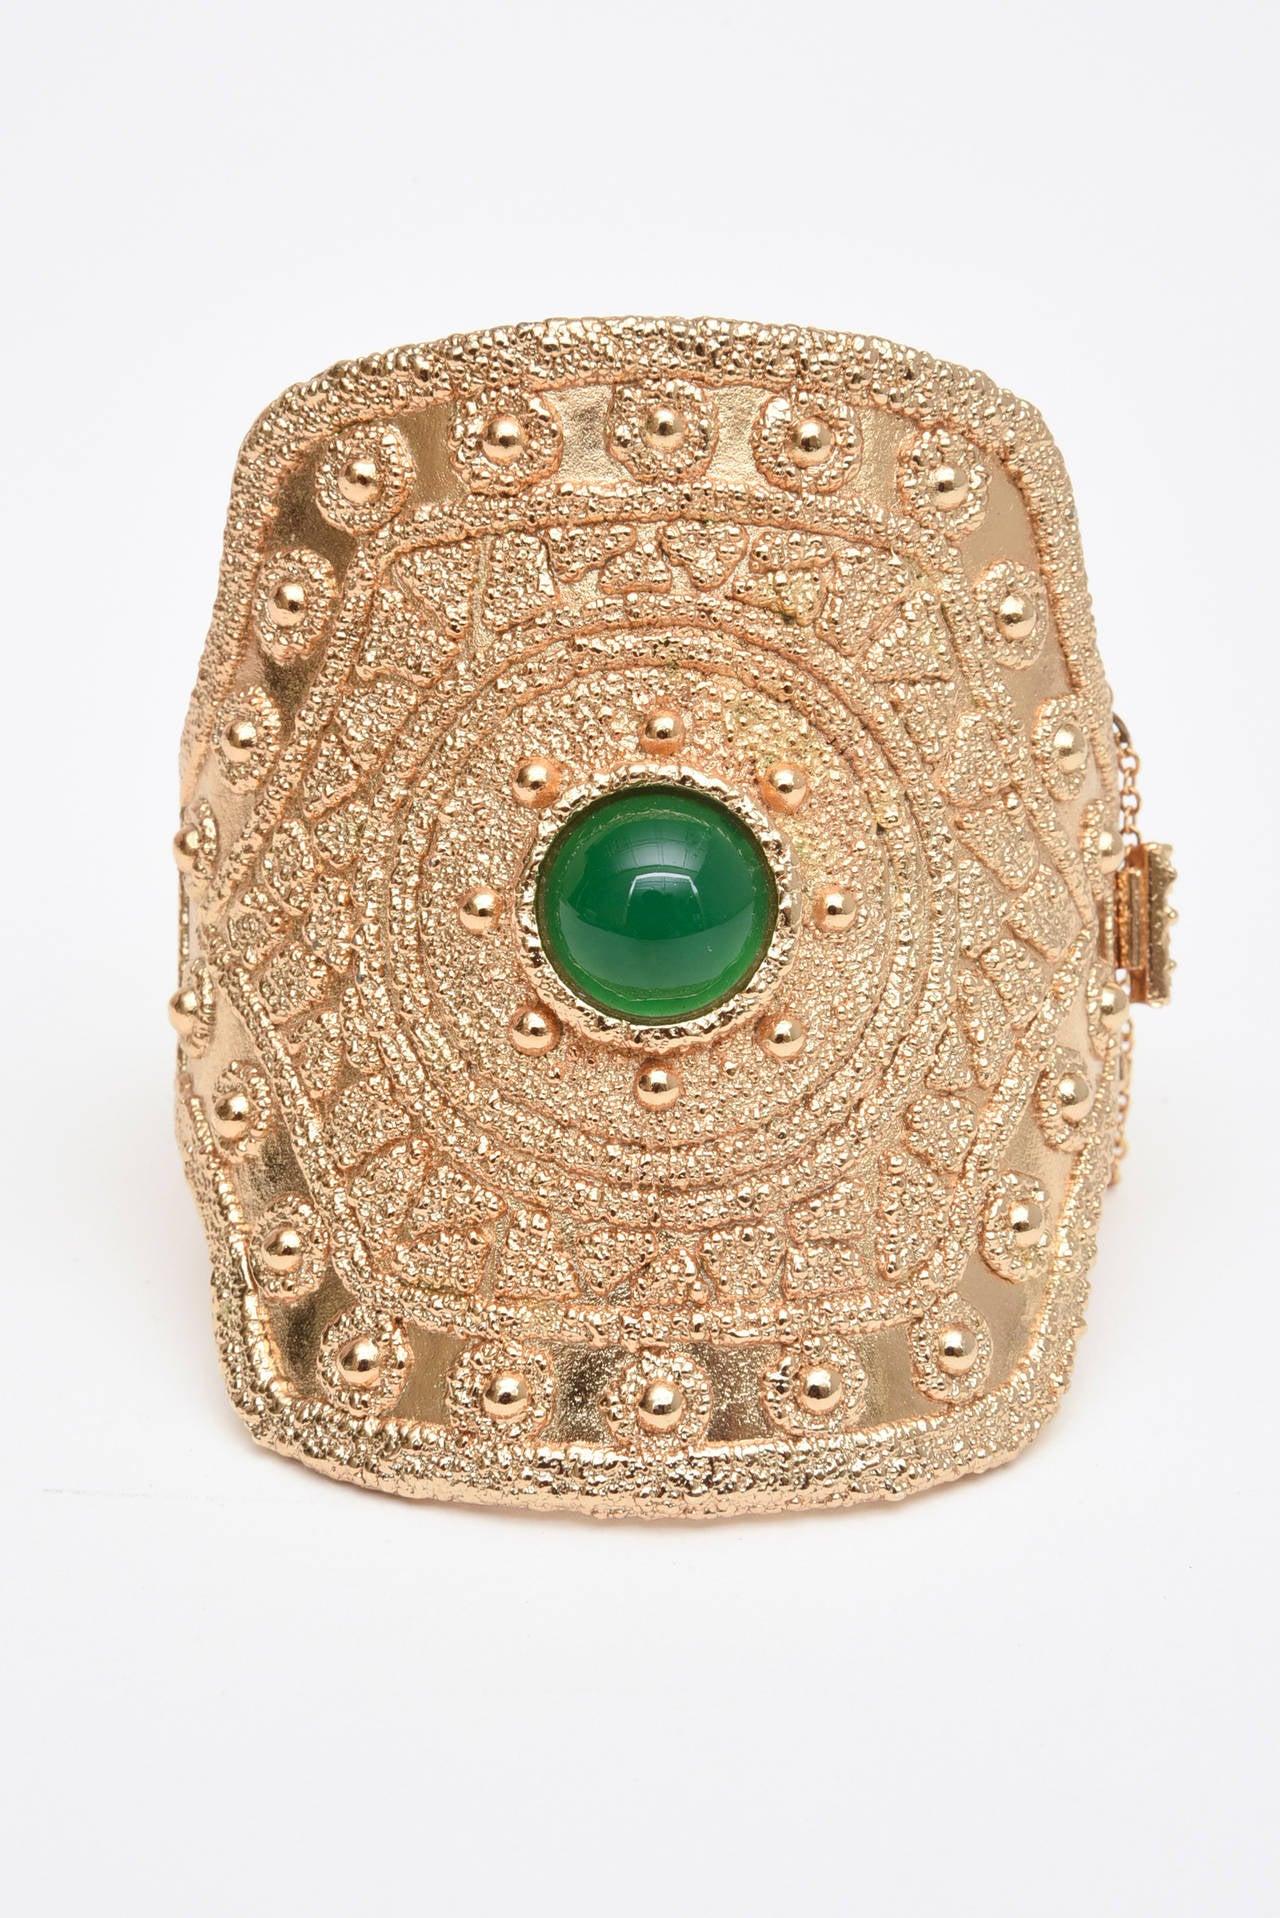 Vintage Napier Textural Gold Plated Green Glass Cuff Bracelet 2